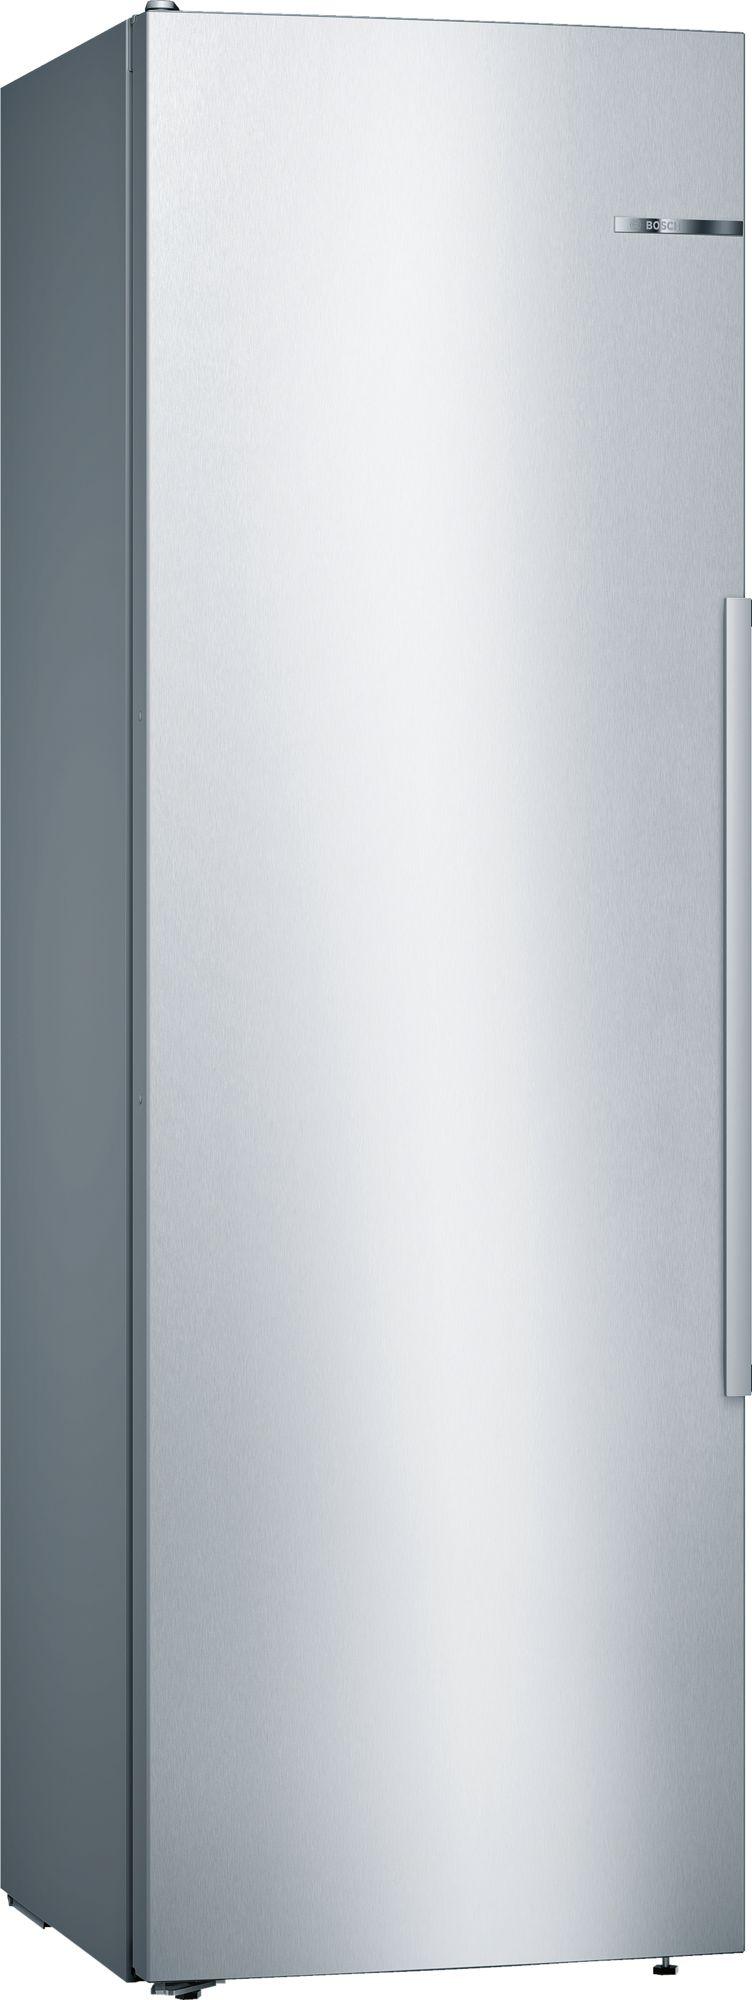 Bosch Stand Kühlschrank Türen Edelstahl mit Anti-Fingerprint ...